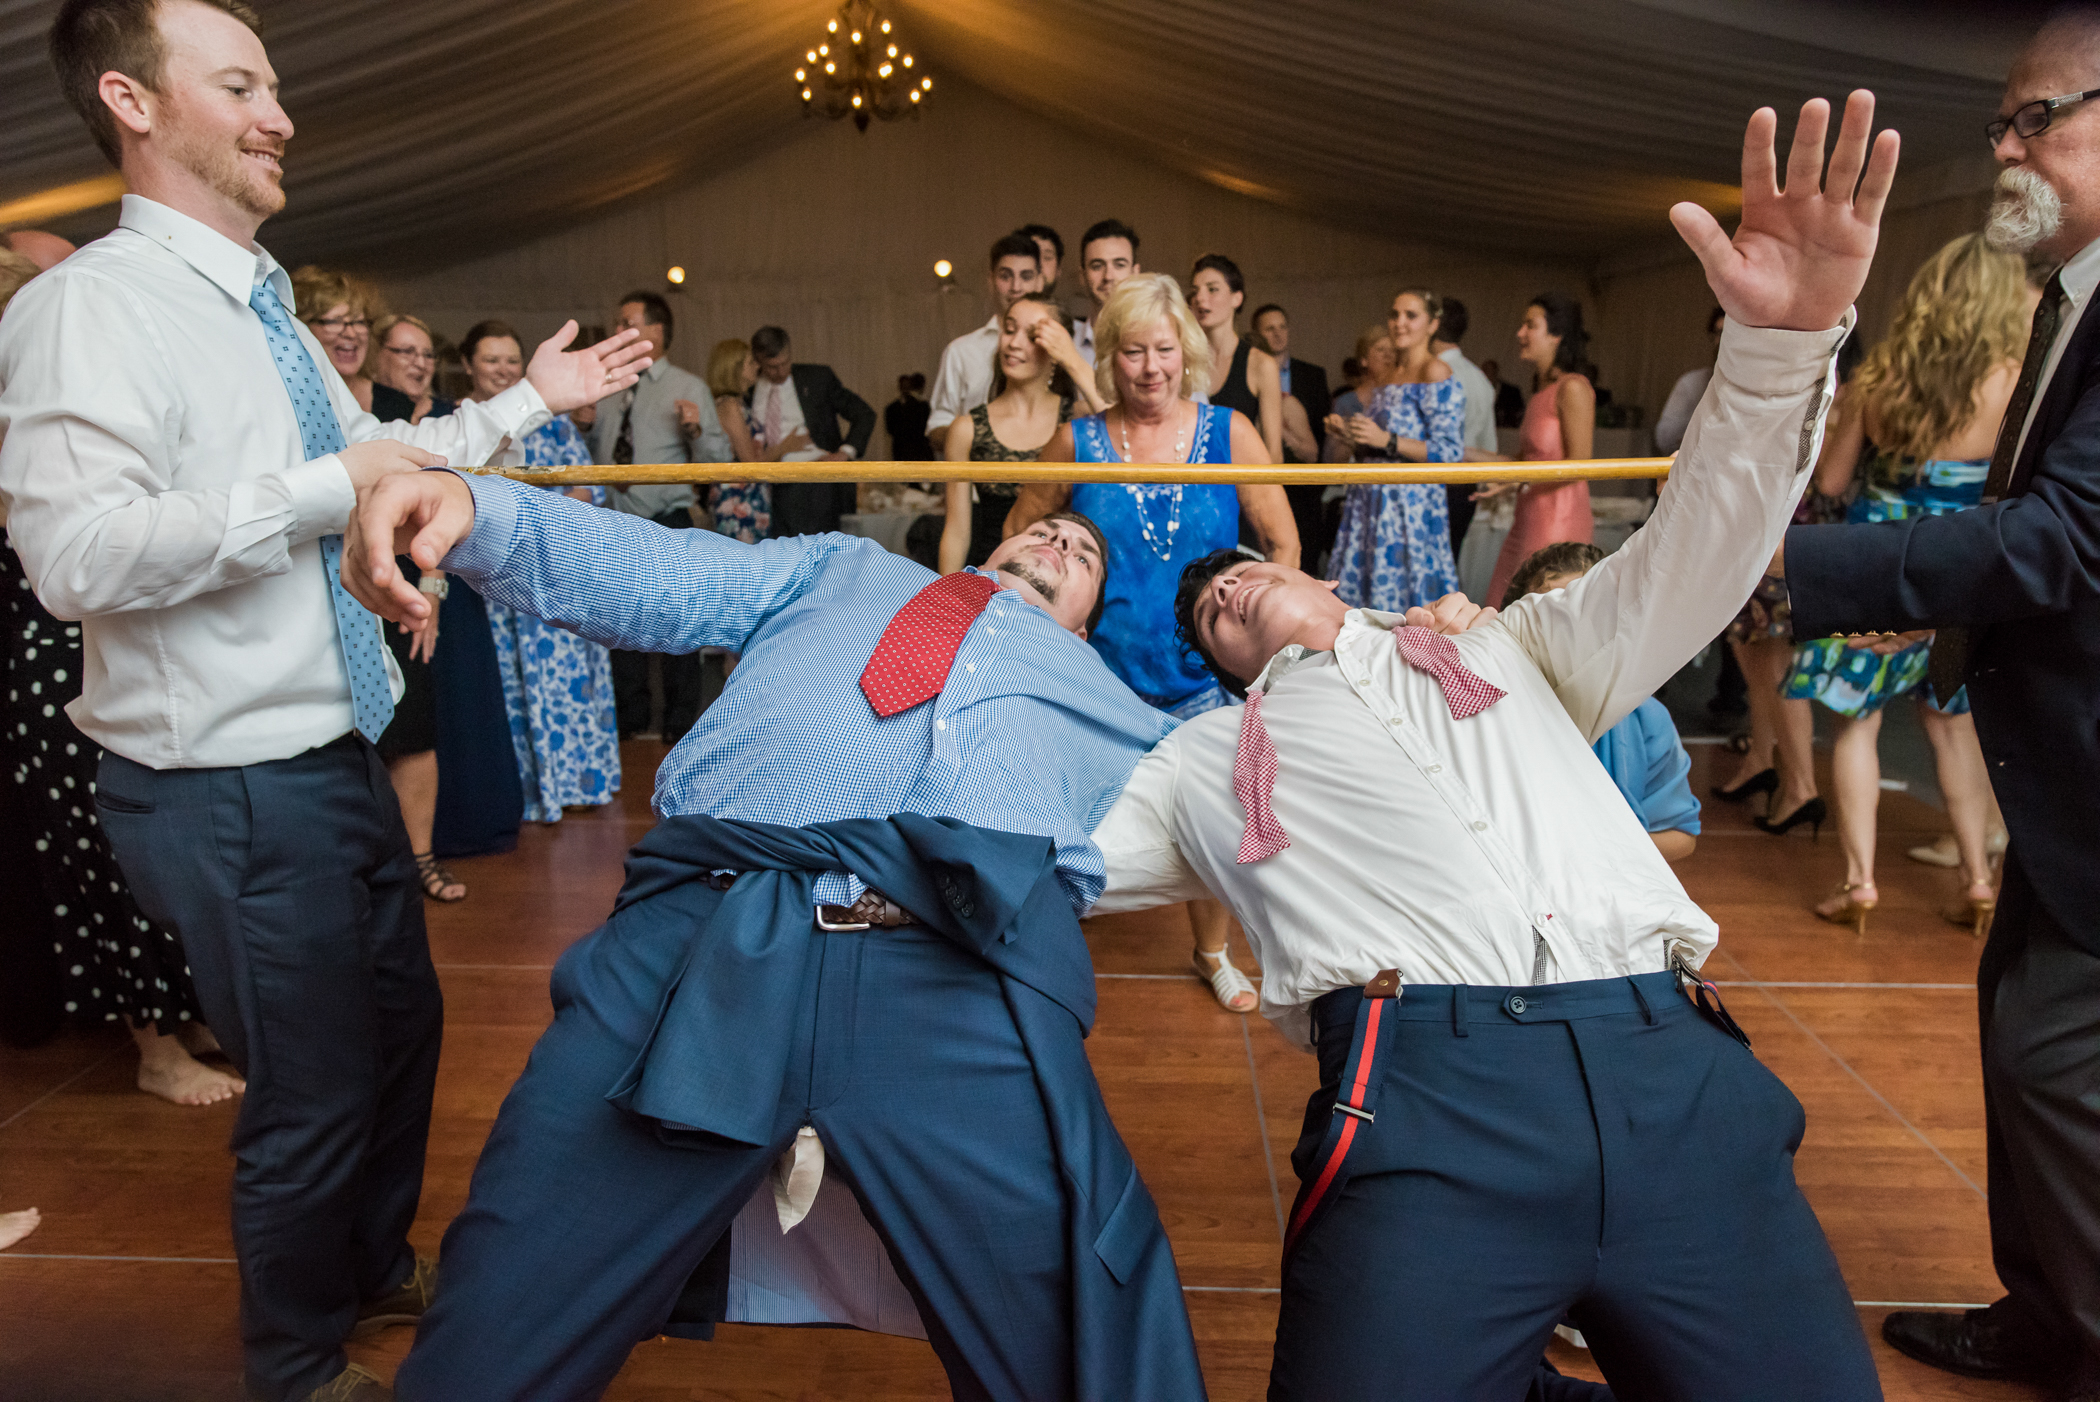 Stefy Hilmer Photography-limbo dancing at wedding reception.jpg